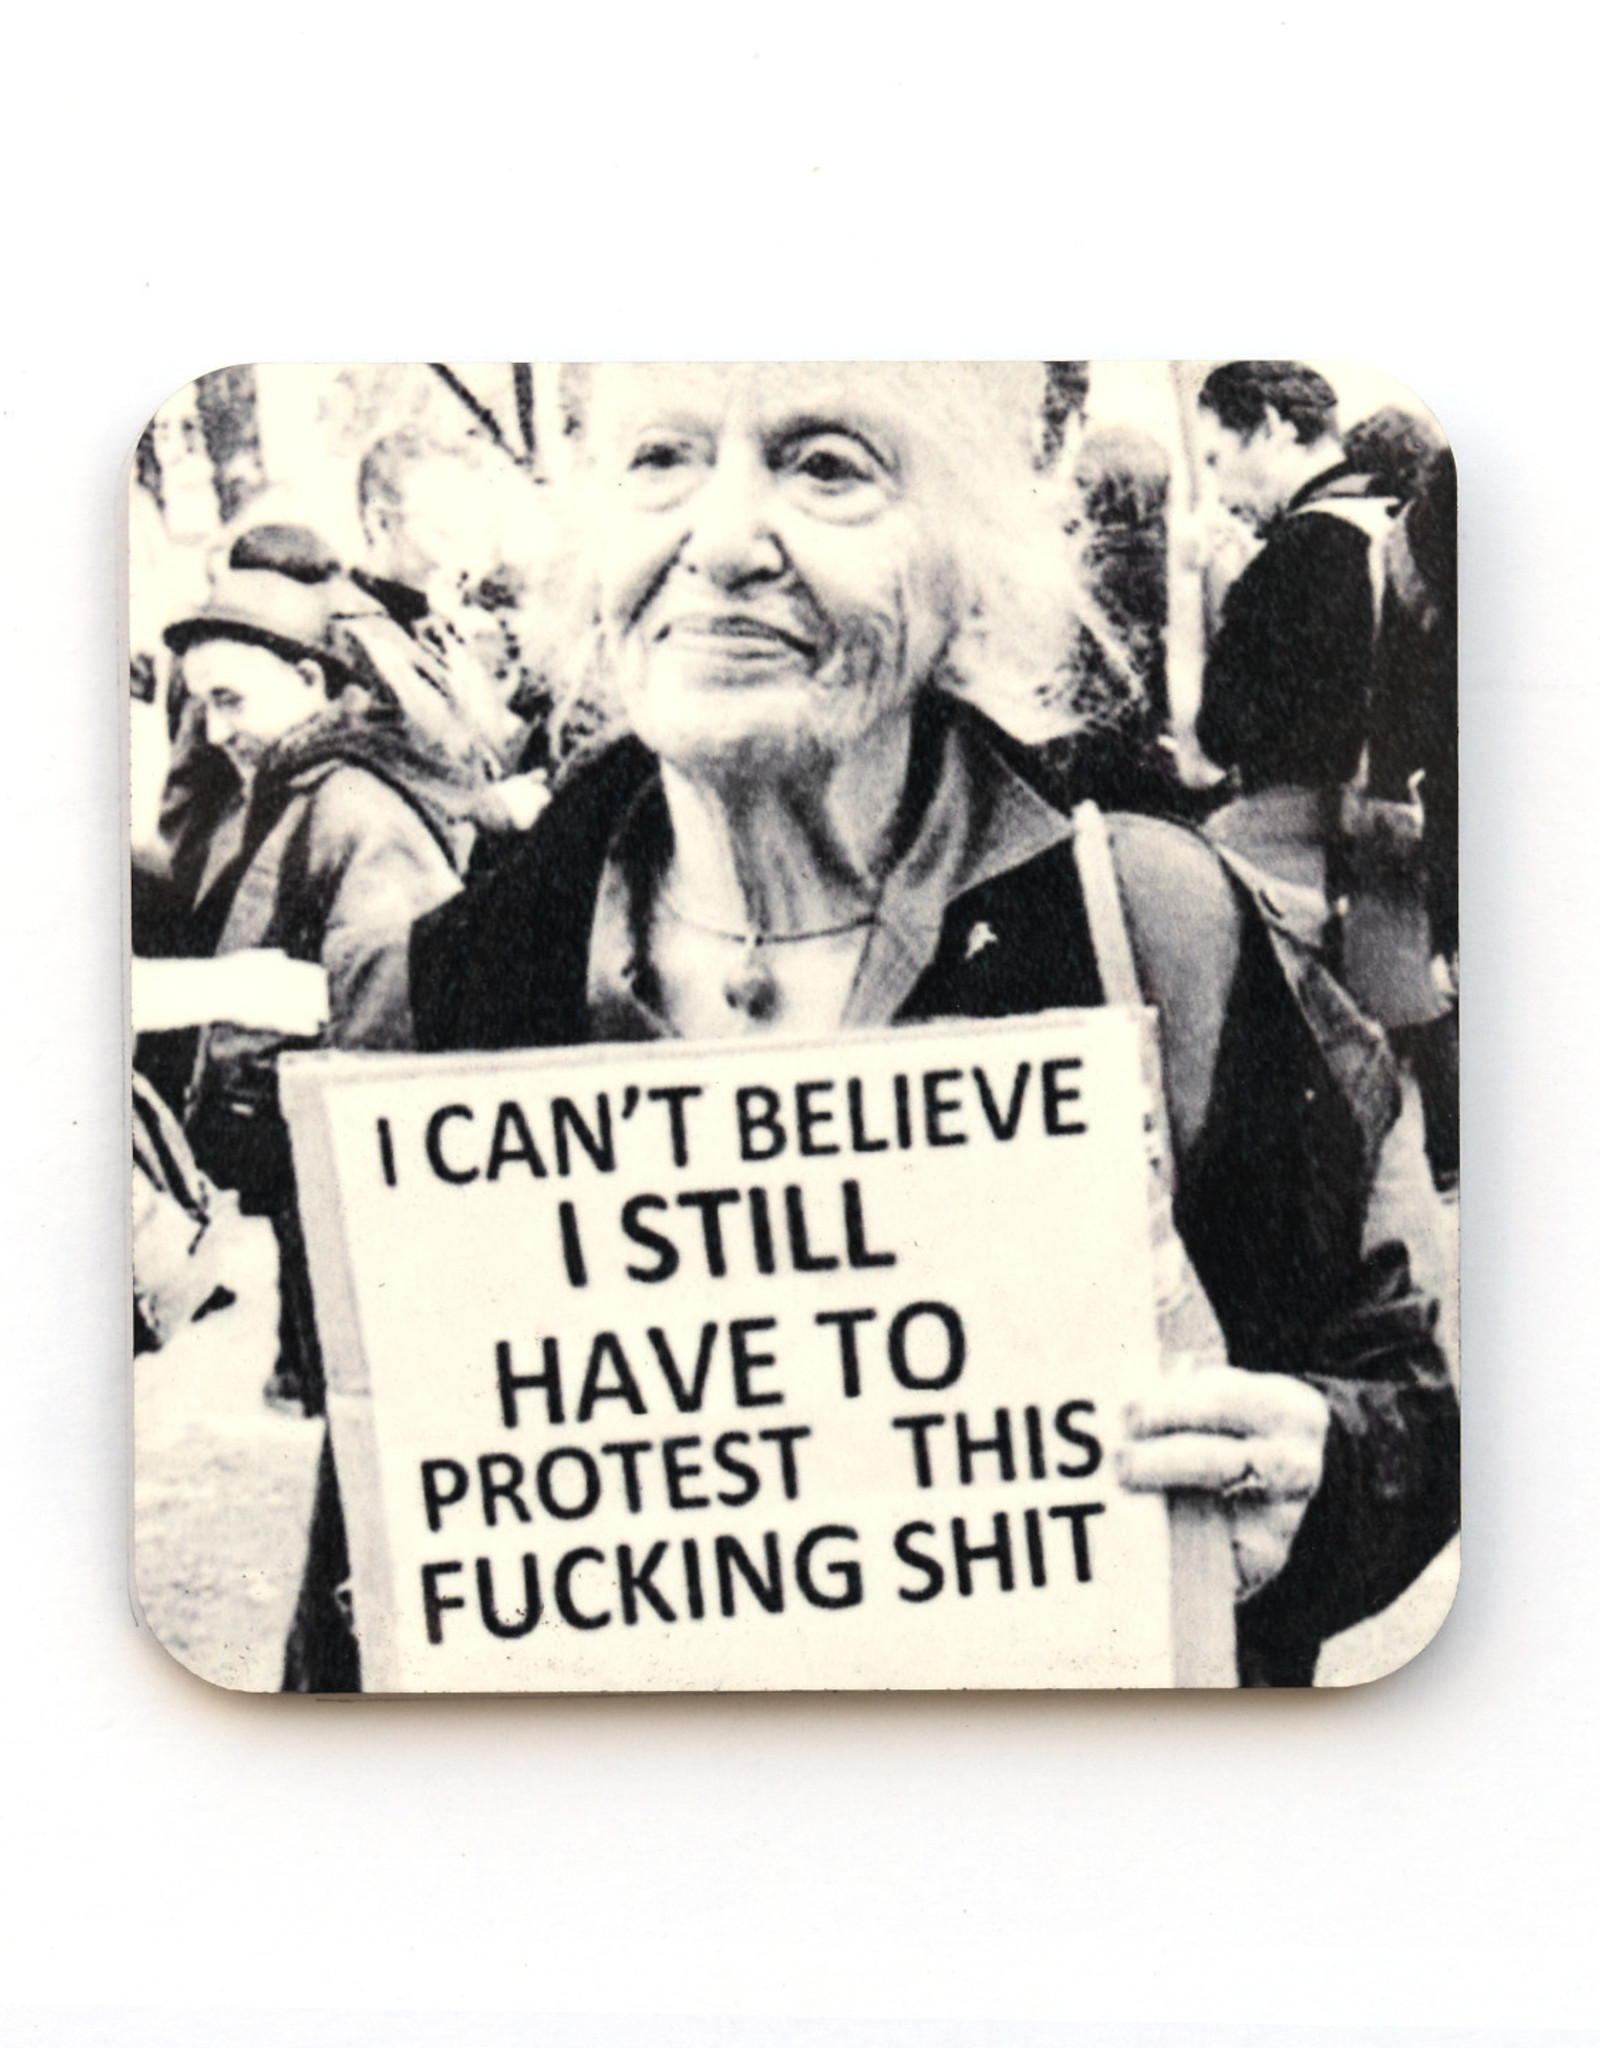 Still Protesting This Shit Coaster